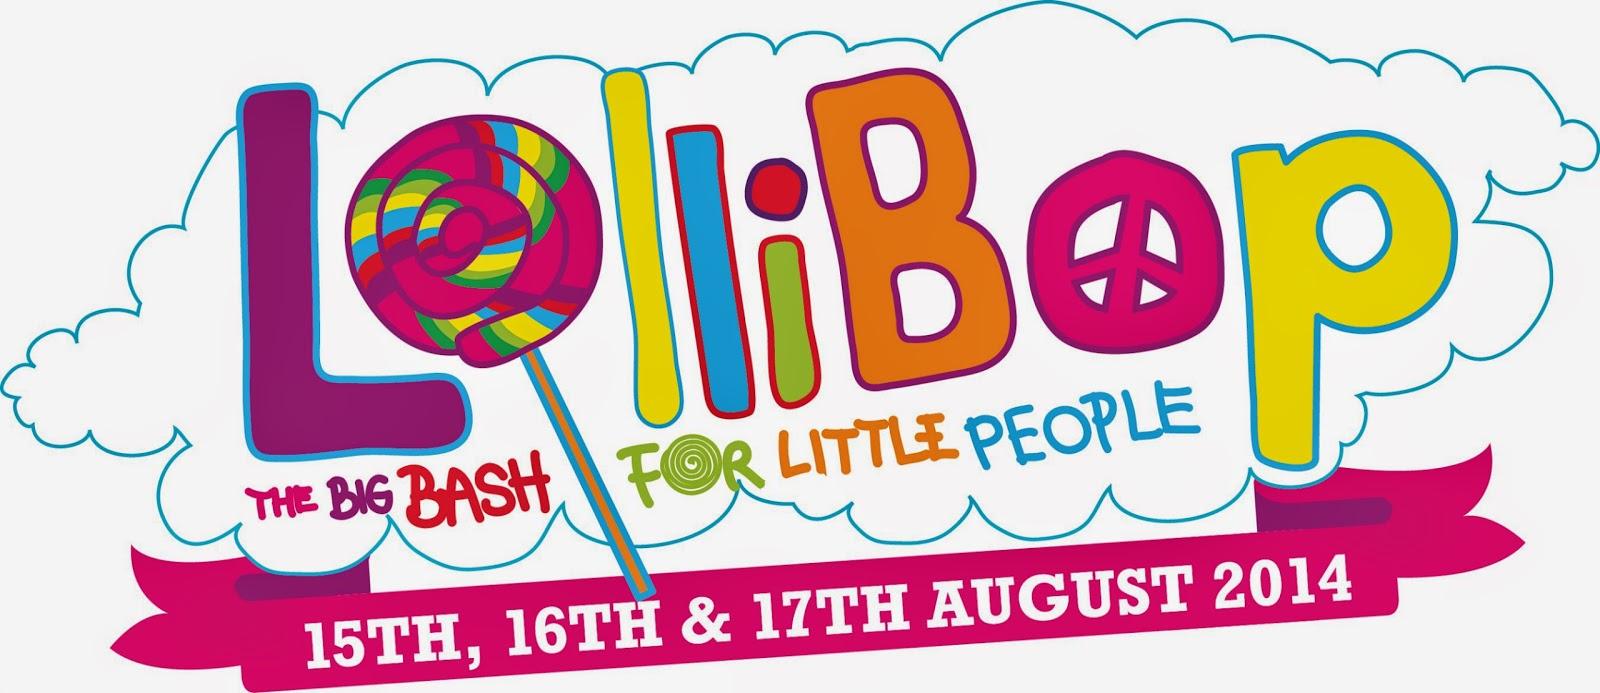 Lollibop Festival 2014, Children festival, CBeebies line up